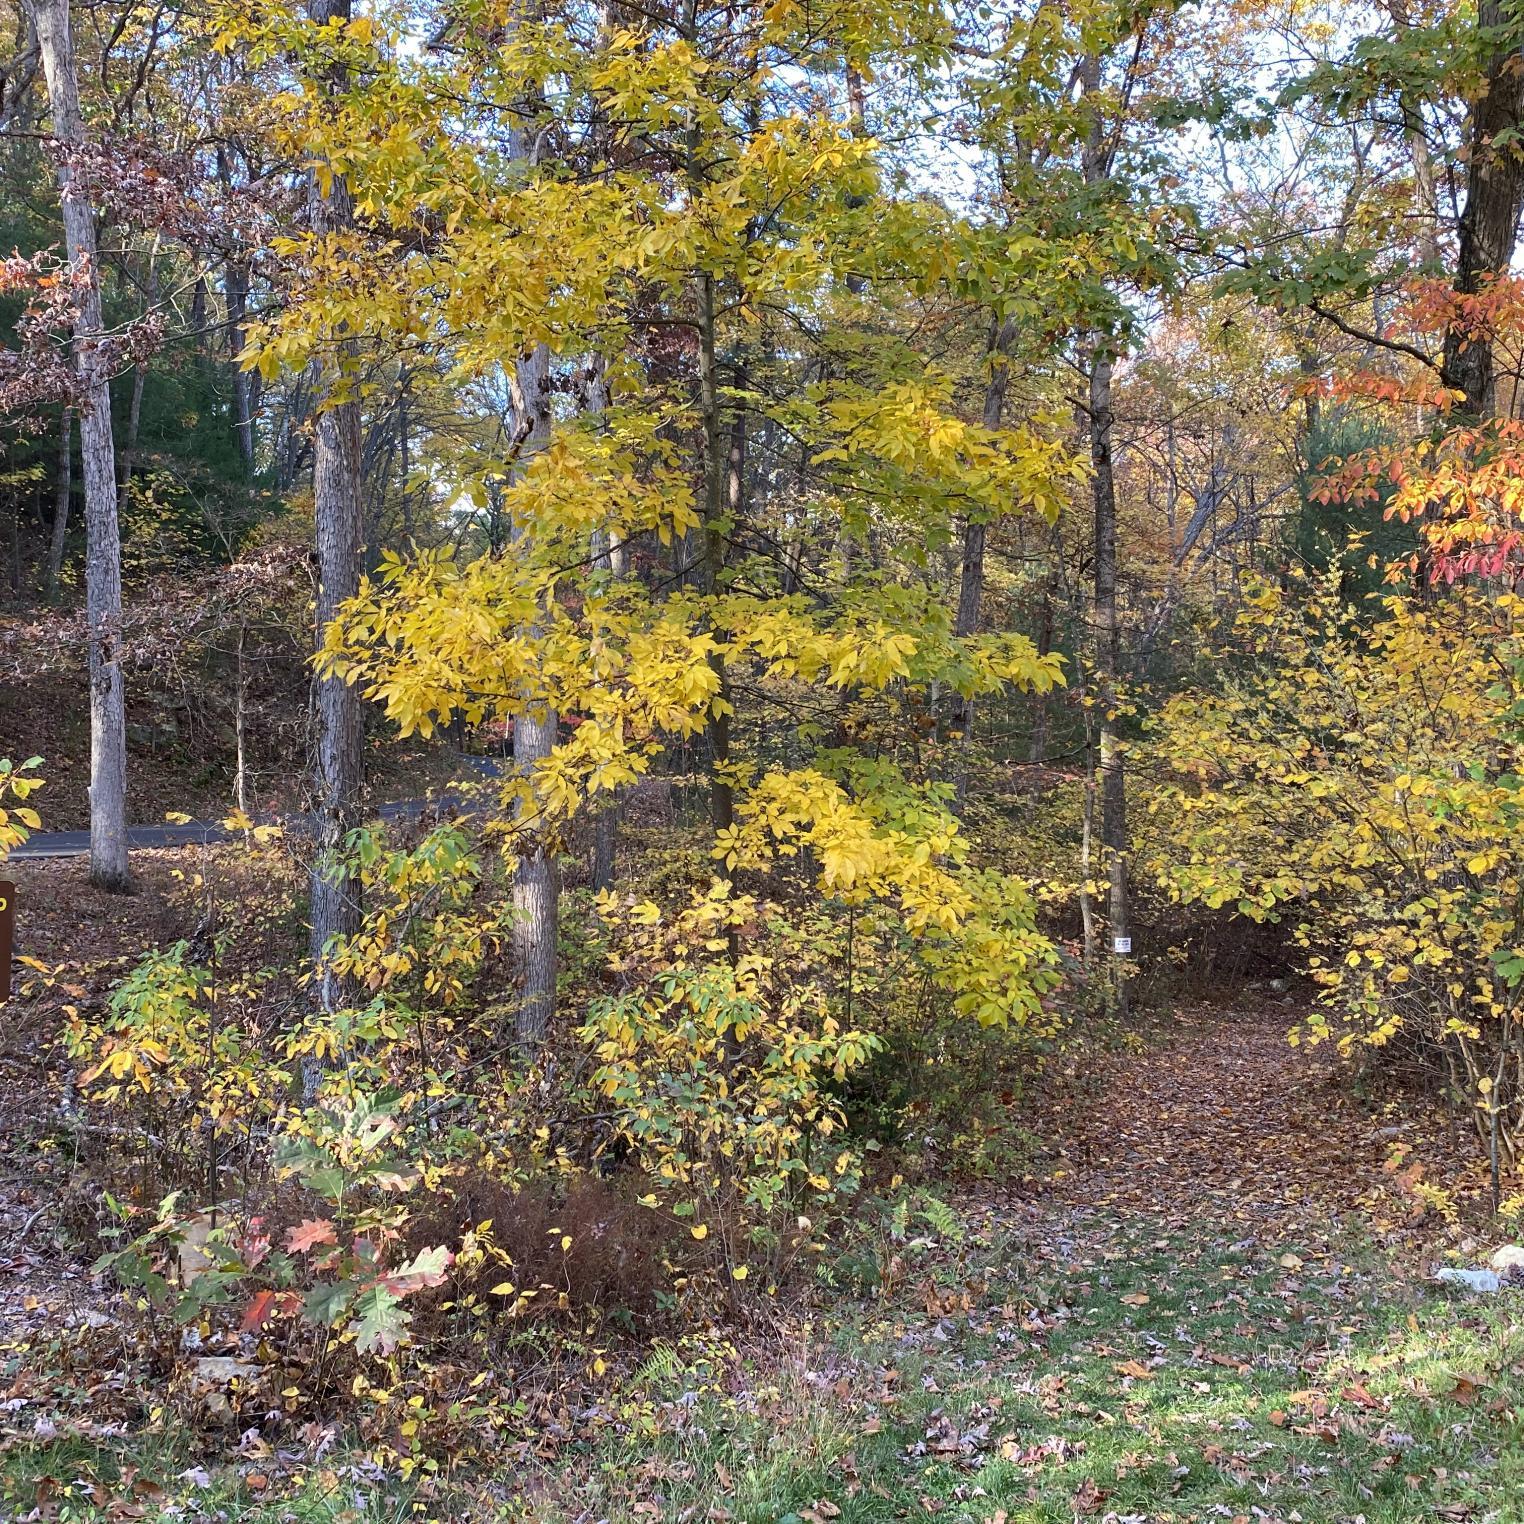 Kings Gap Hollow Trail